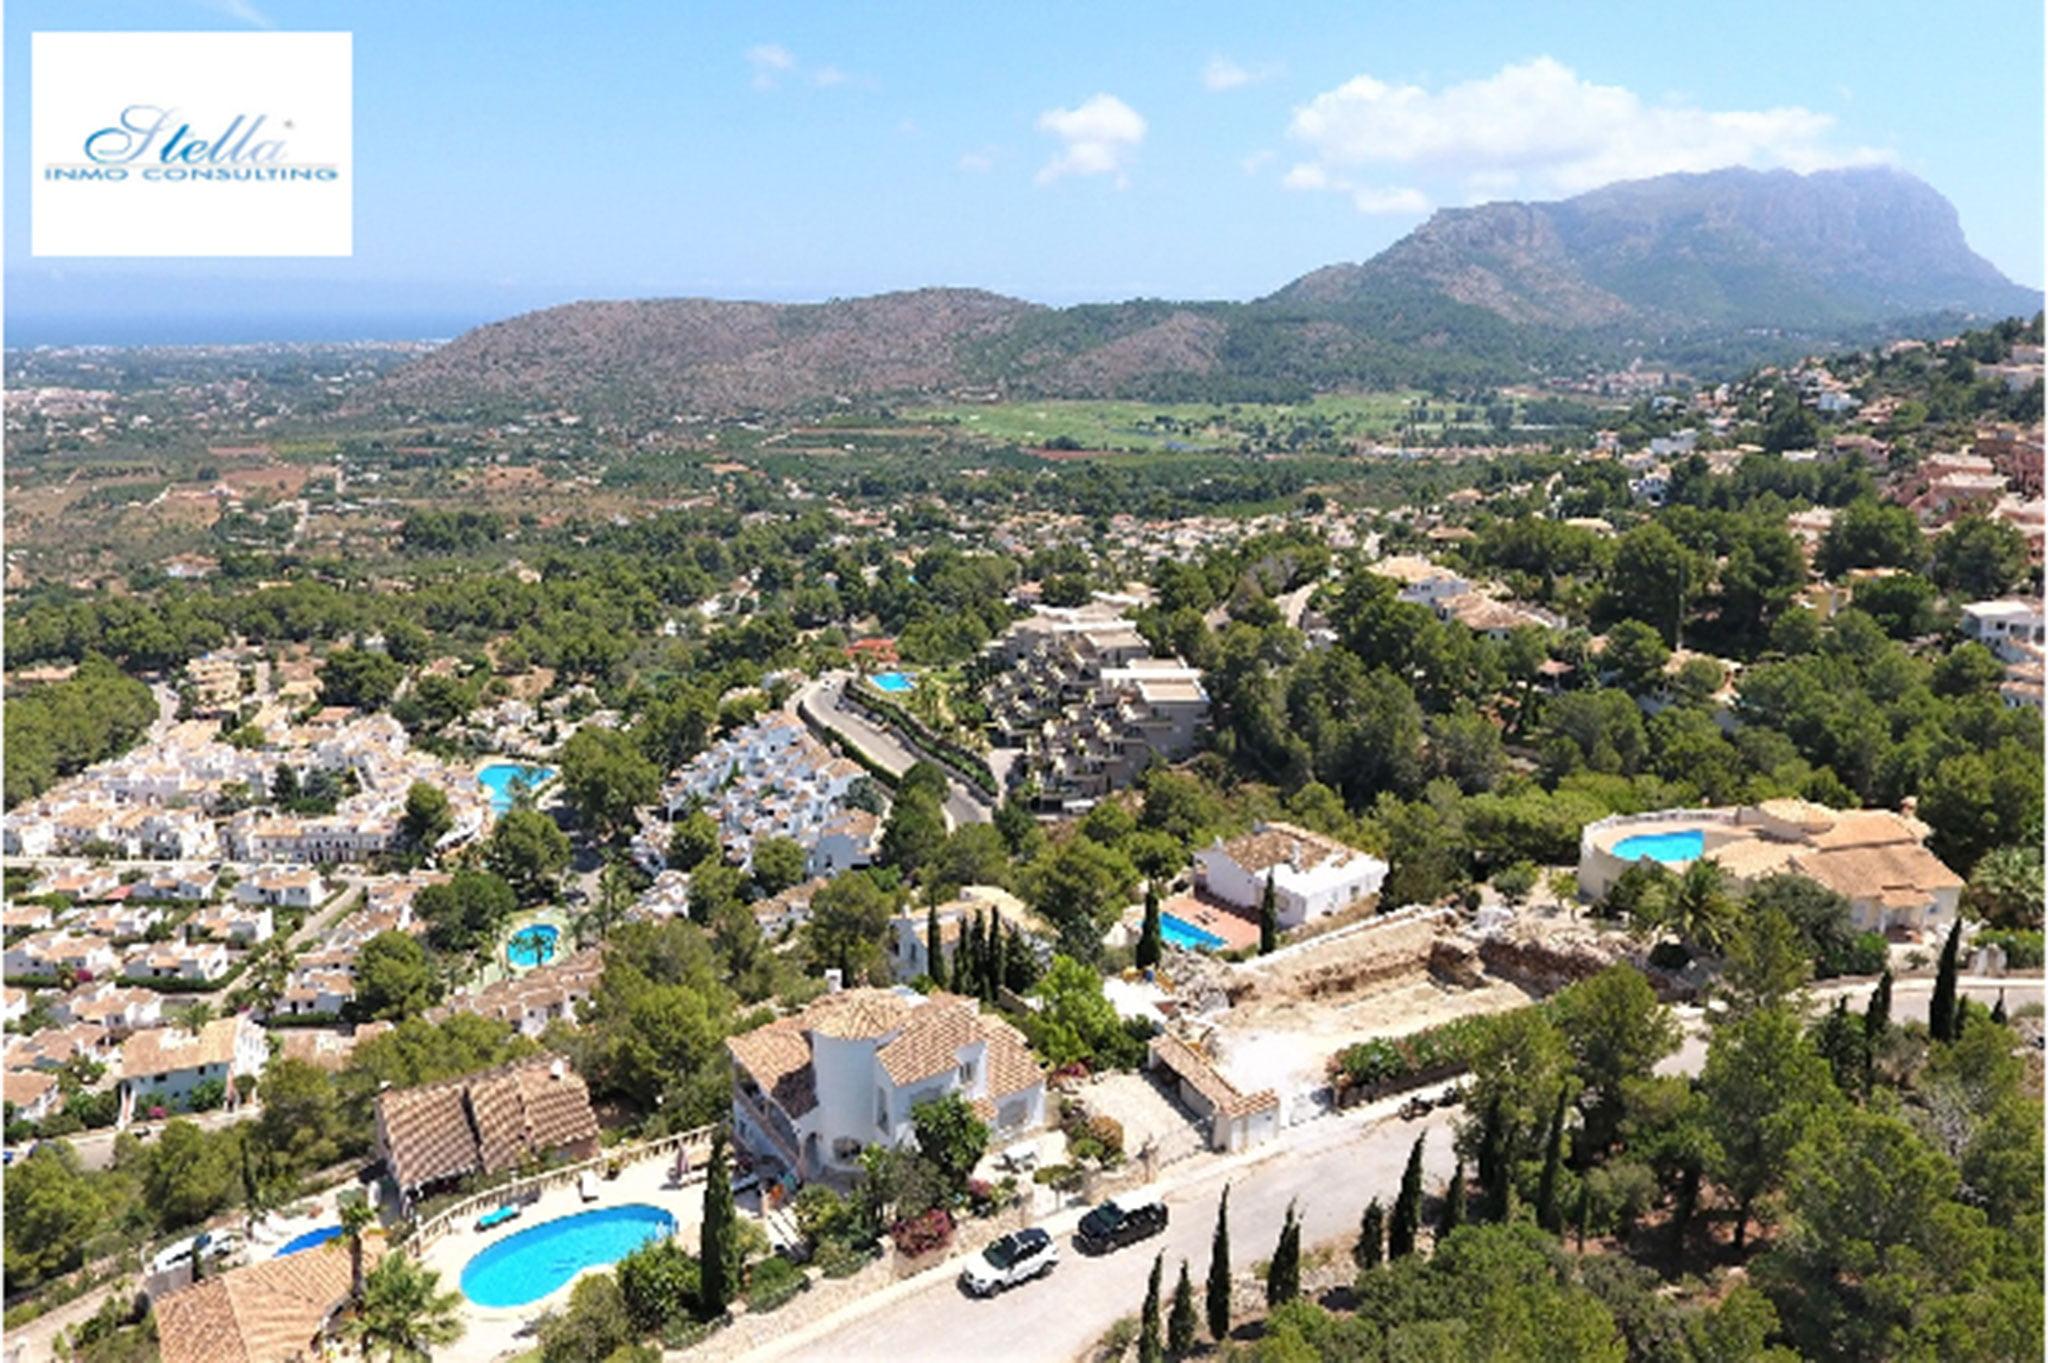 Vista des d'una casa a la venda a La Sella, Pedreguer - Stella Inmo Consulting